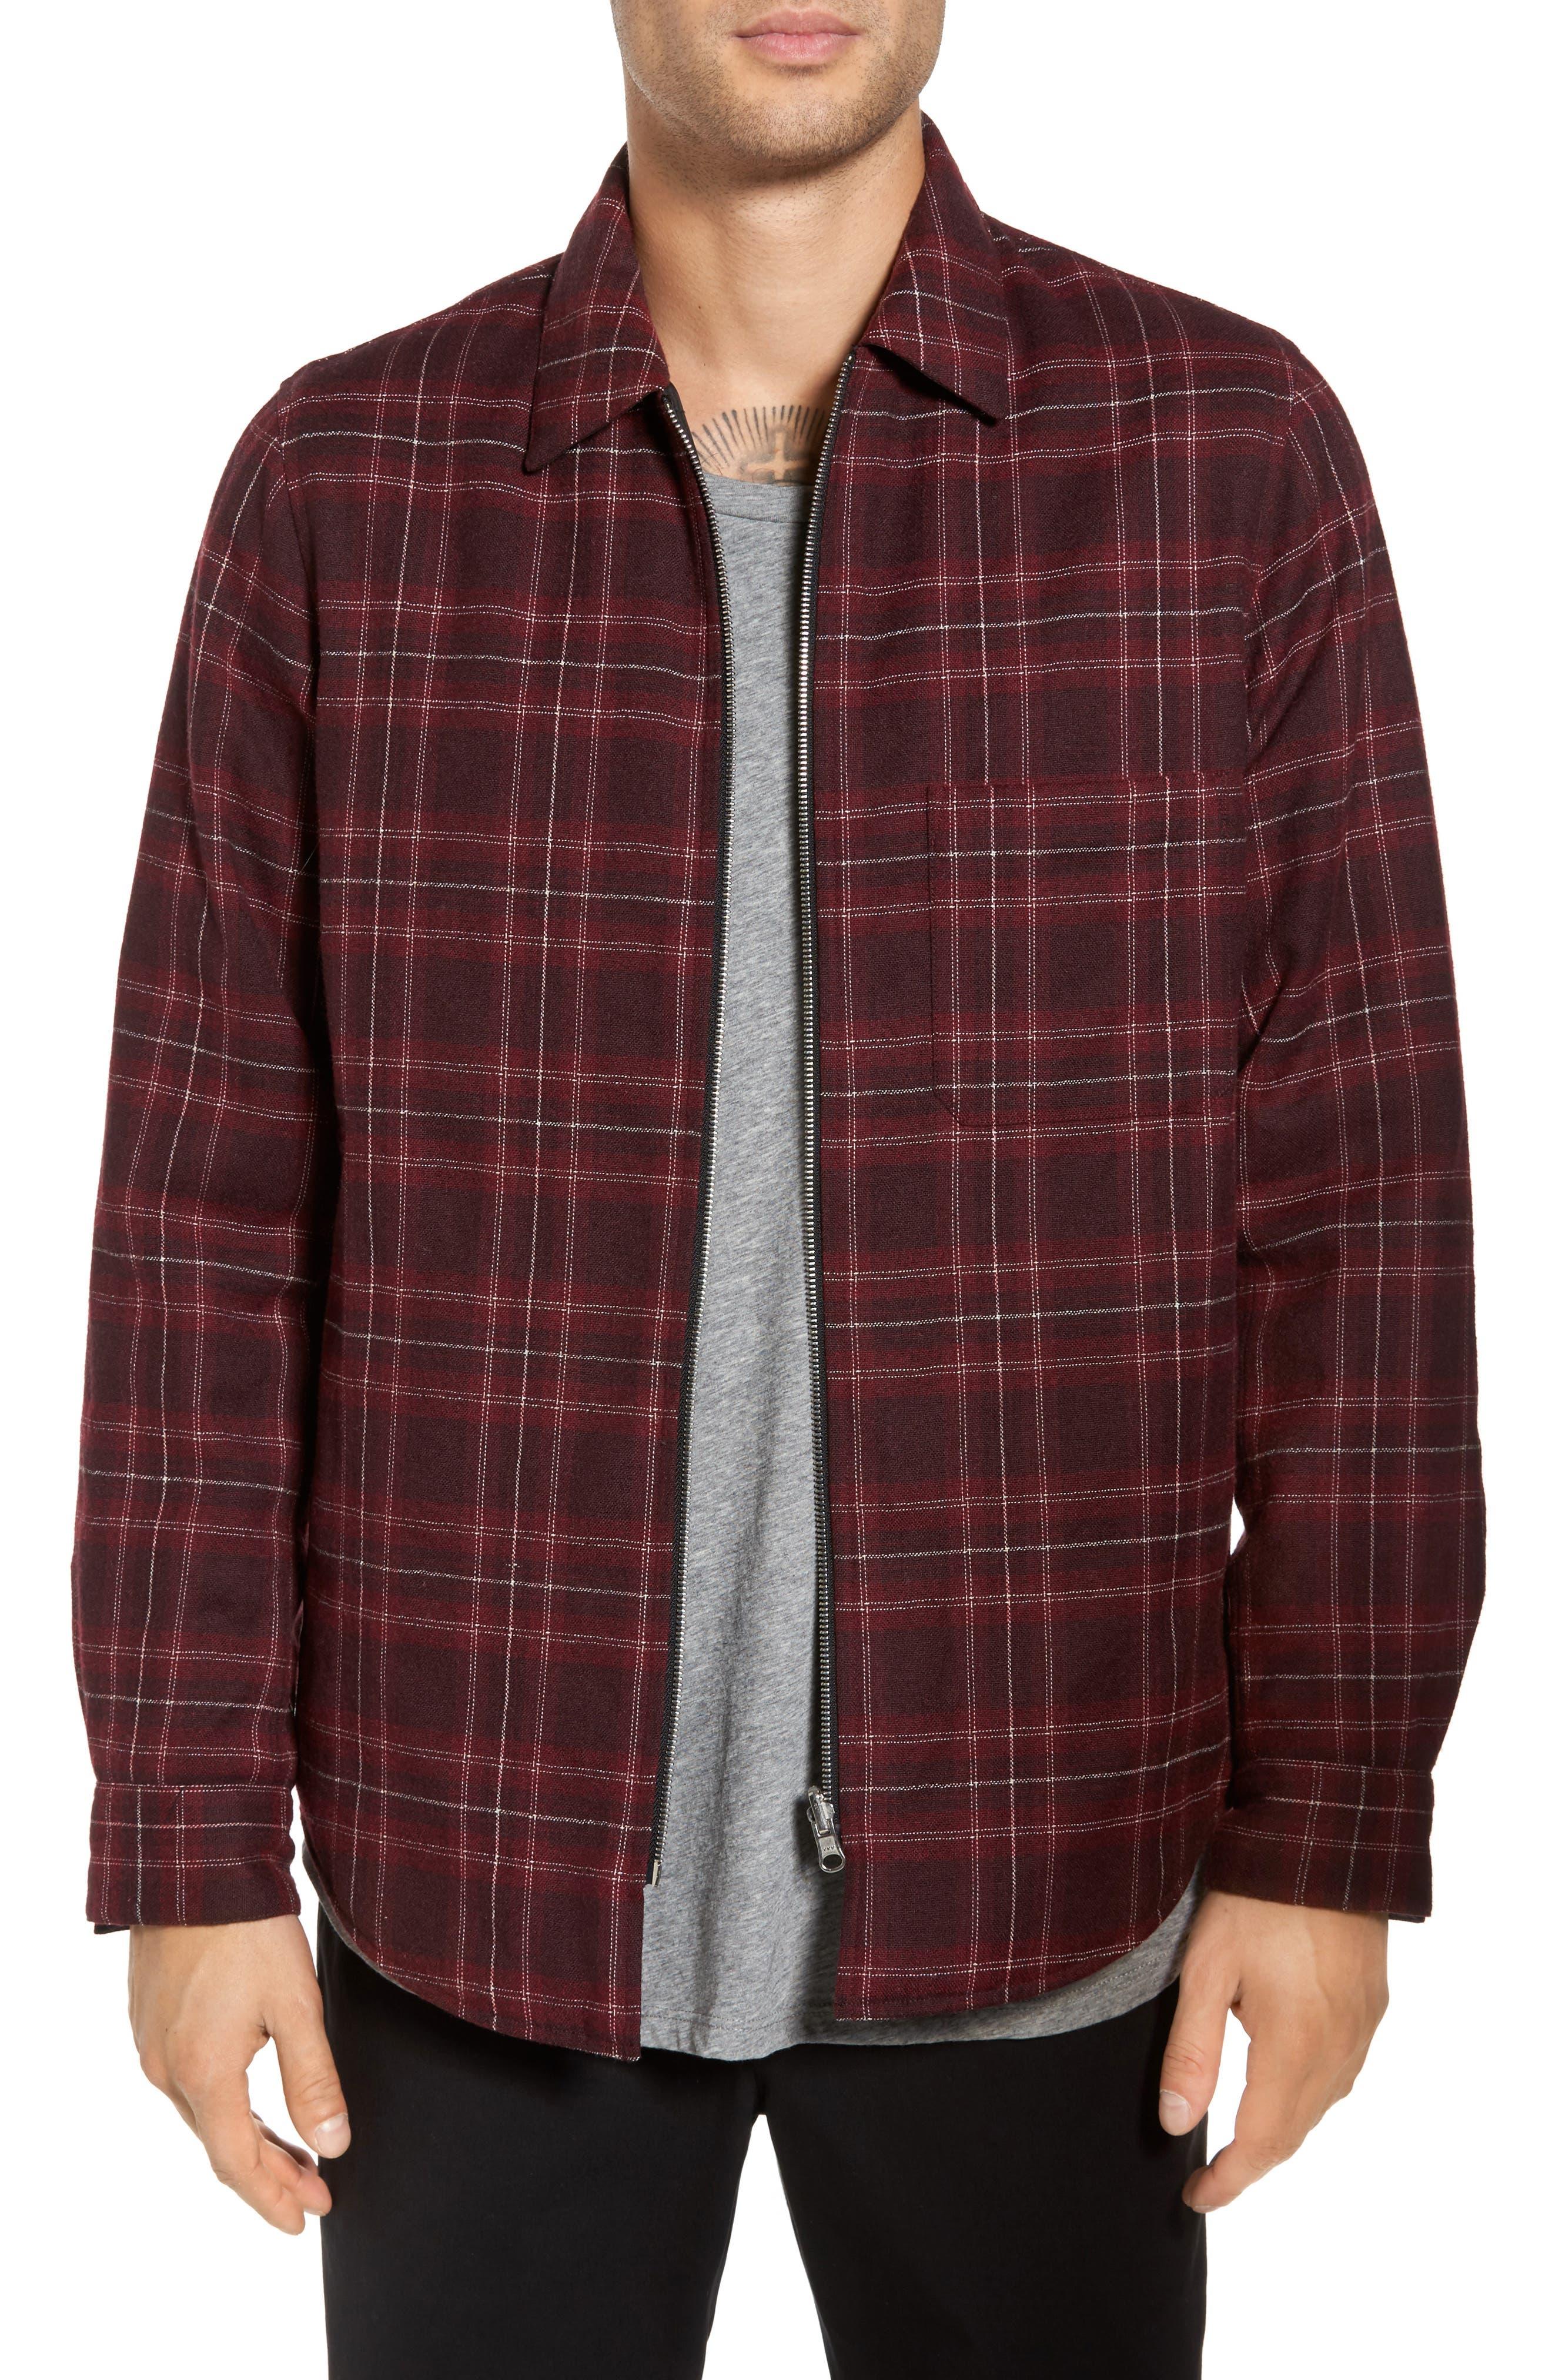 Alternate Image 1 Selected - Theory Reversible Zip Front Shirt Jacket